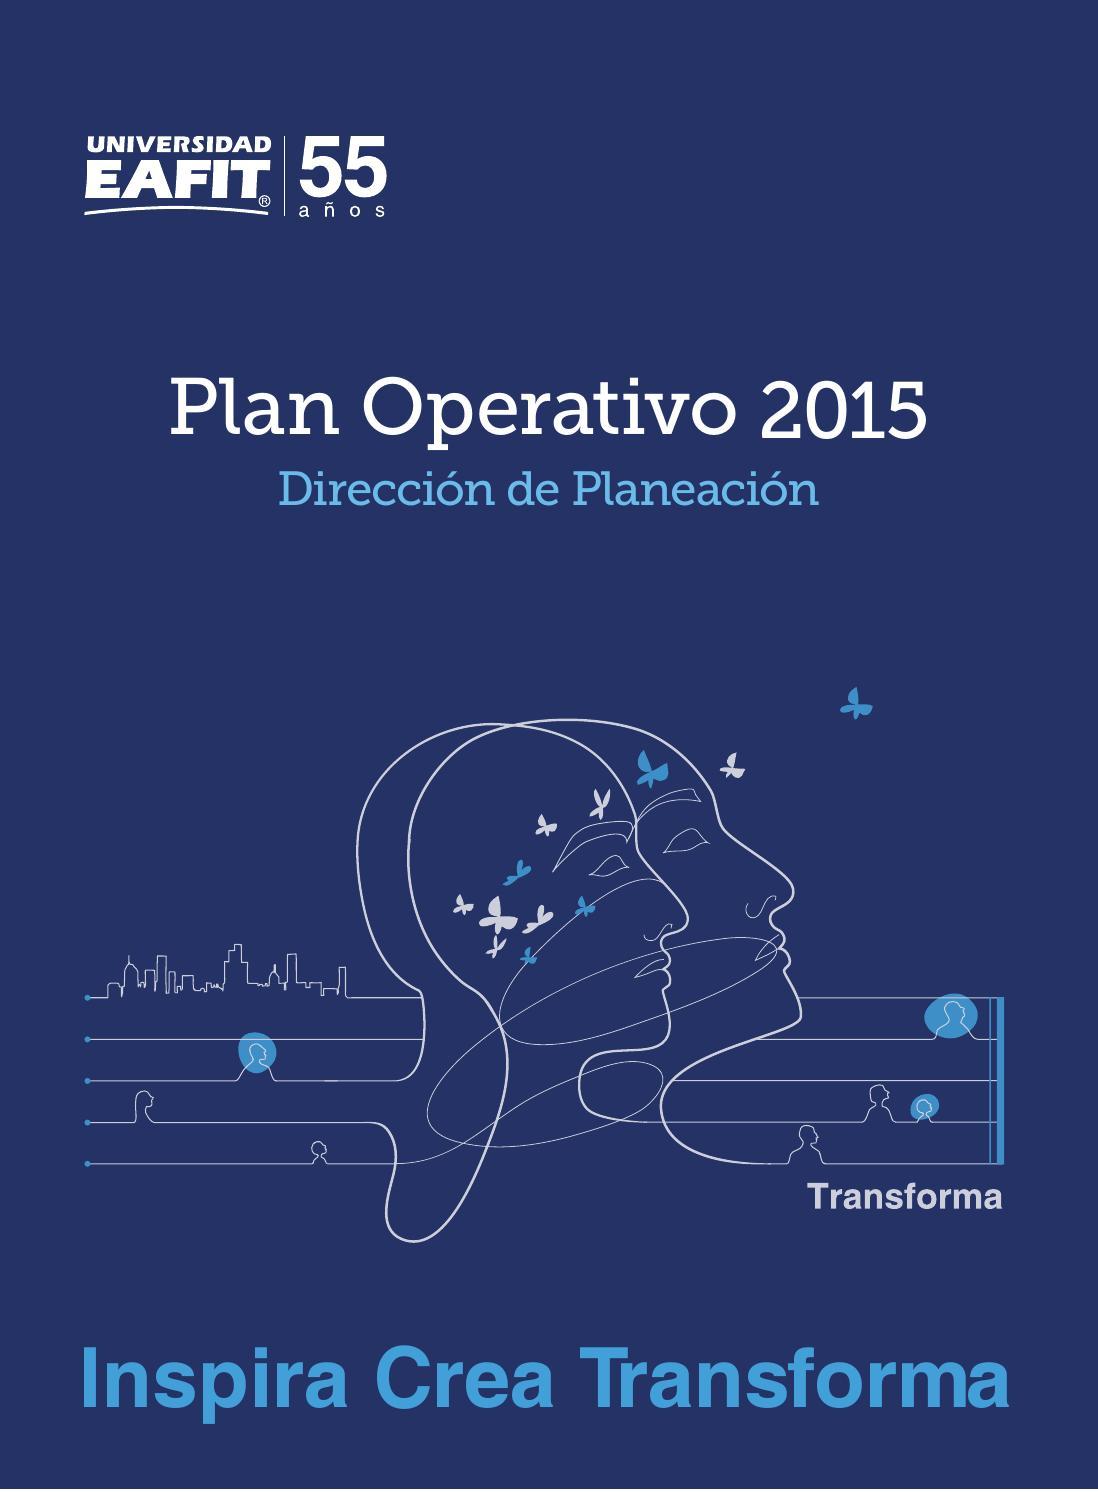 Plan operativo 2015-2 Universidad EAFIT by Universidad EAFIT - issuu